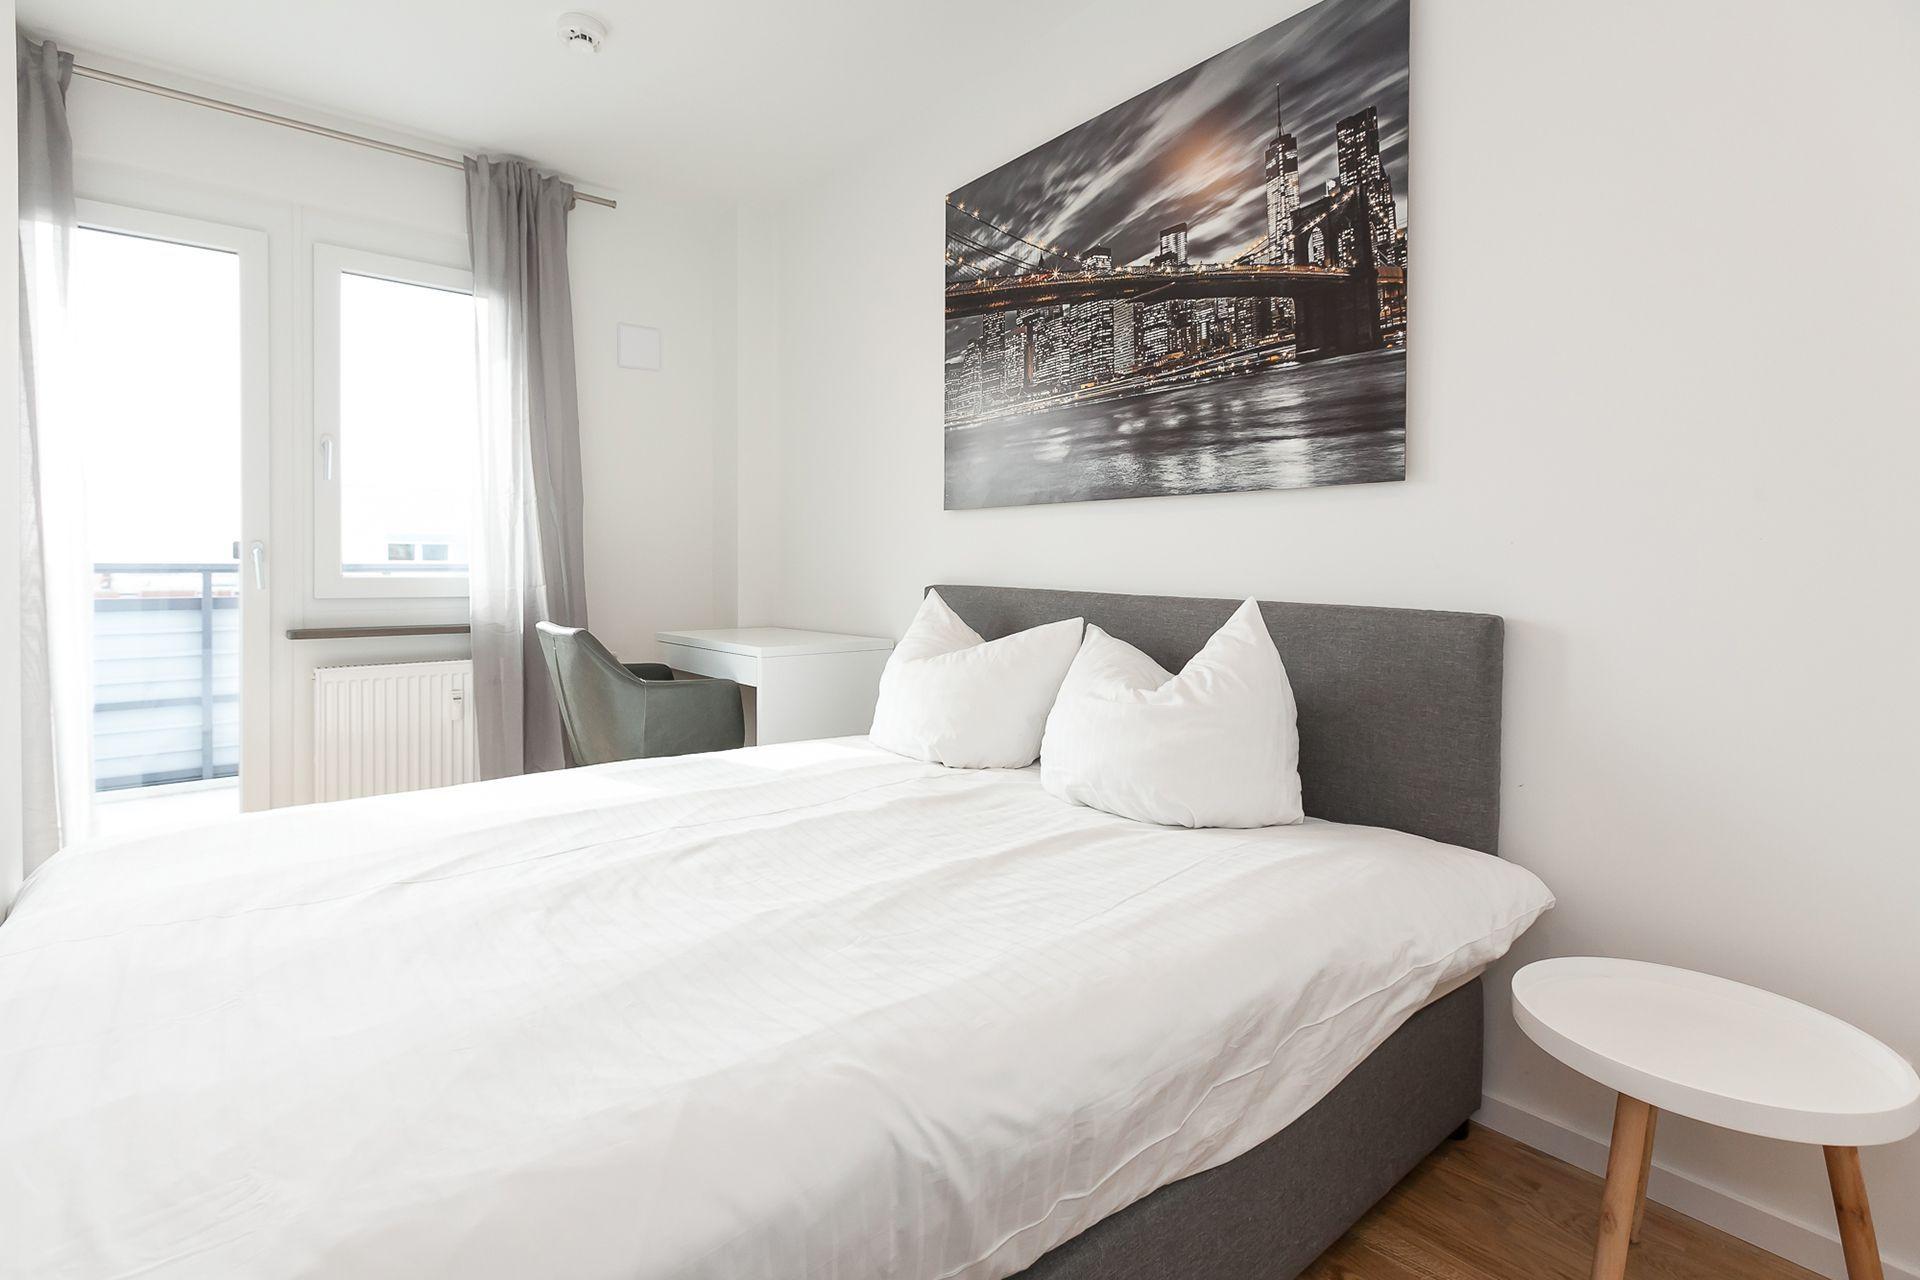 1 Bedroom - Small apartment to rent in Berlin KOEP-KOEP-0405-0